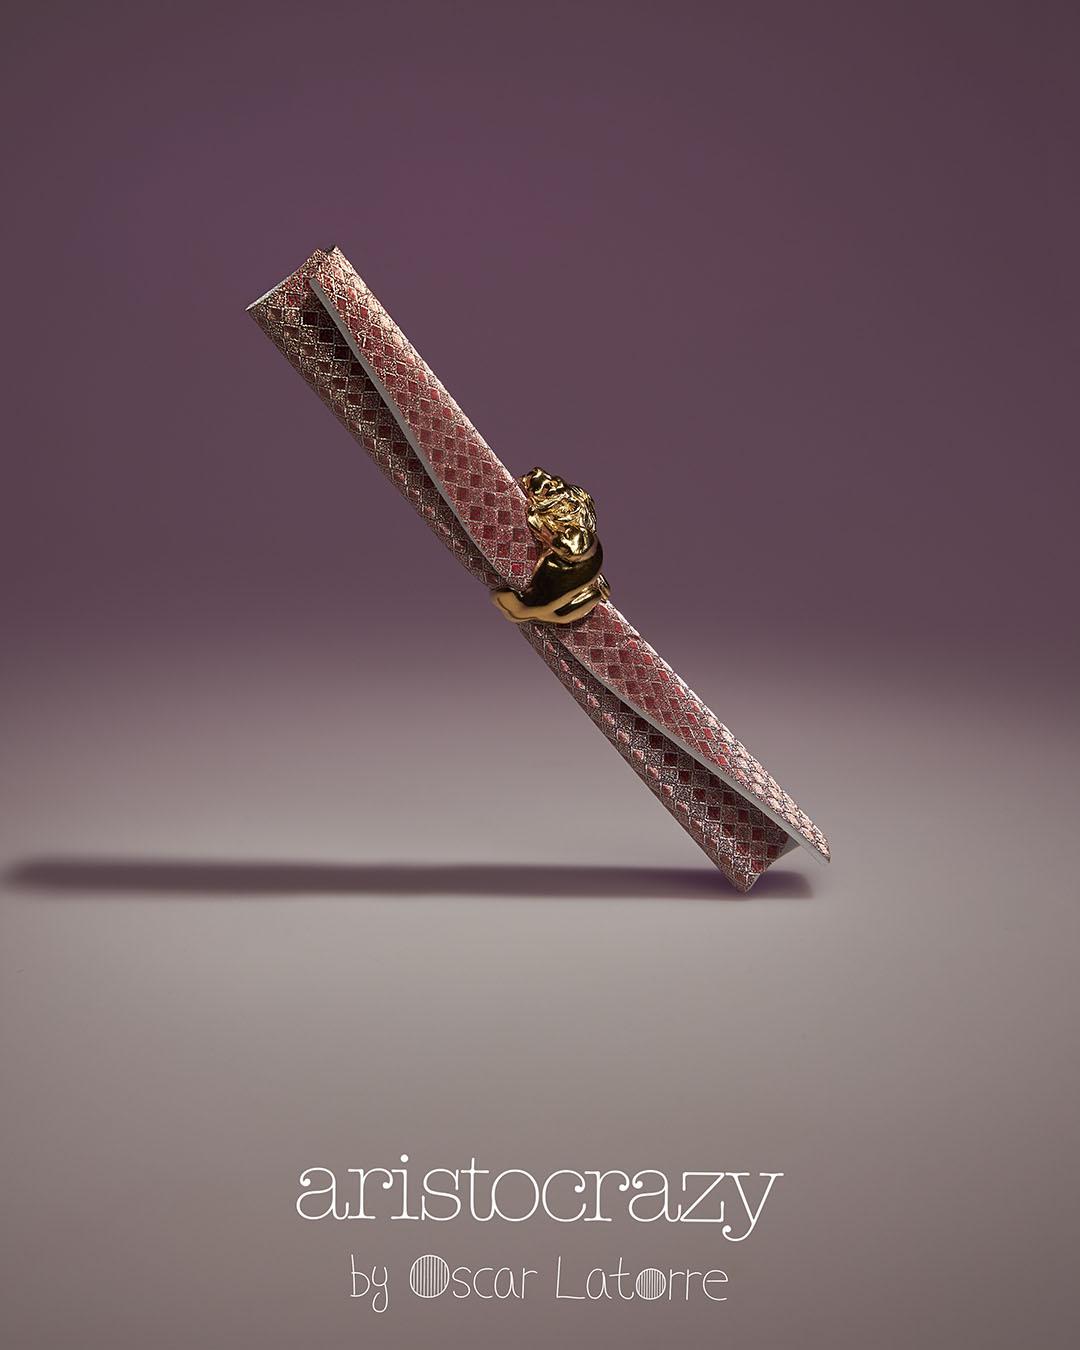 Aristocrazy by Oscar Latorre